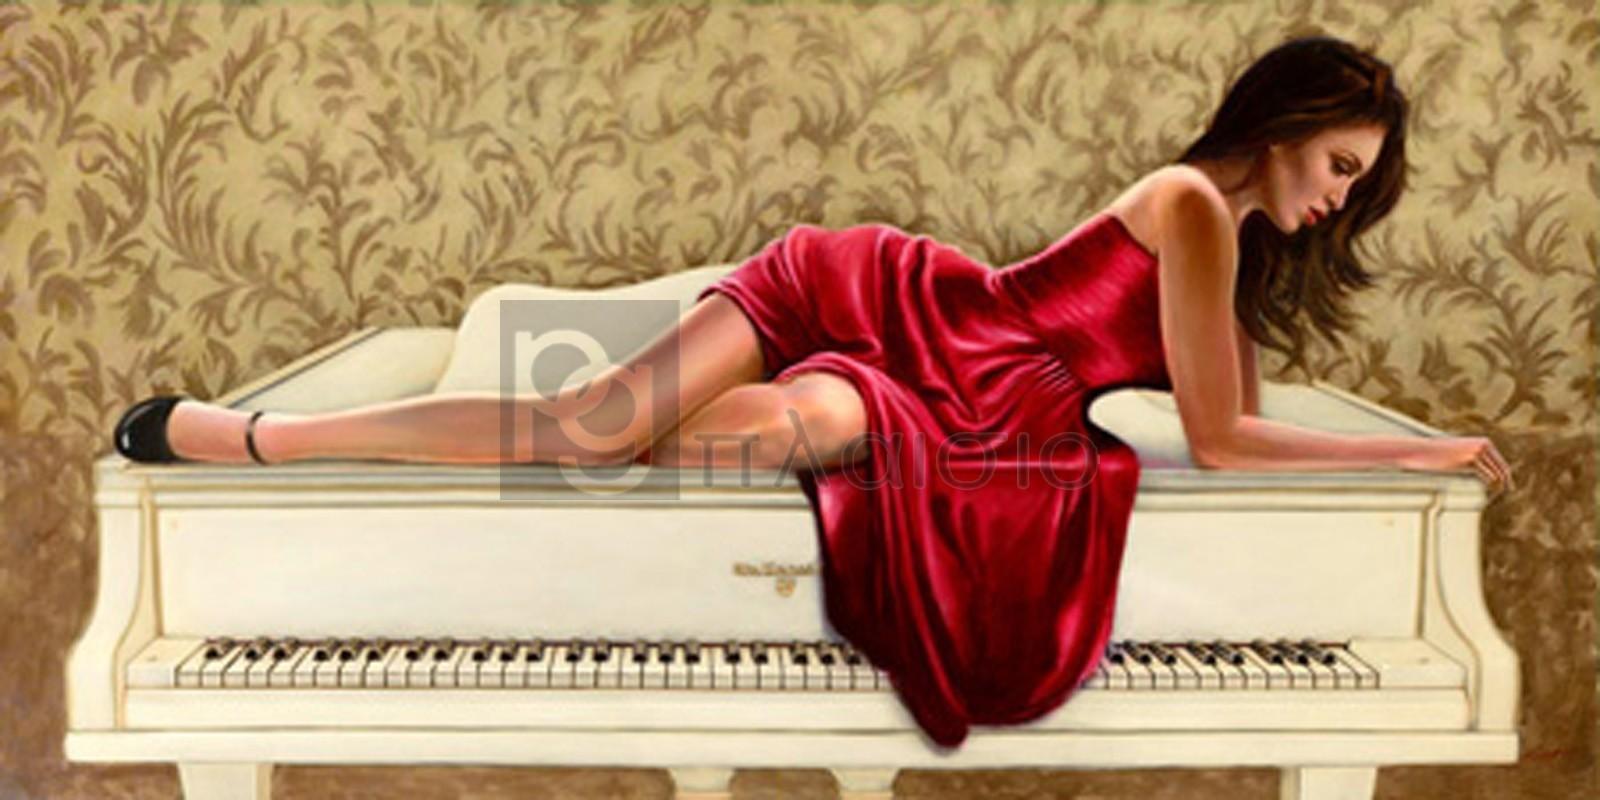 John Silver - Woman in red